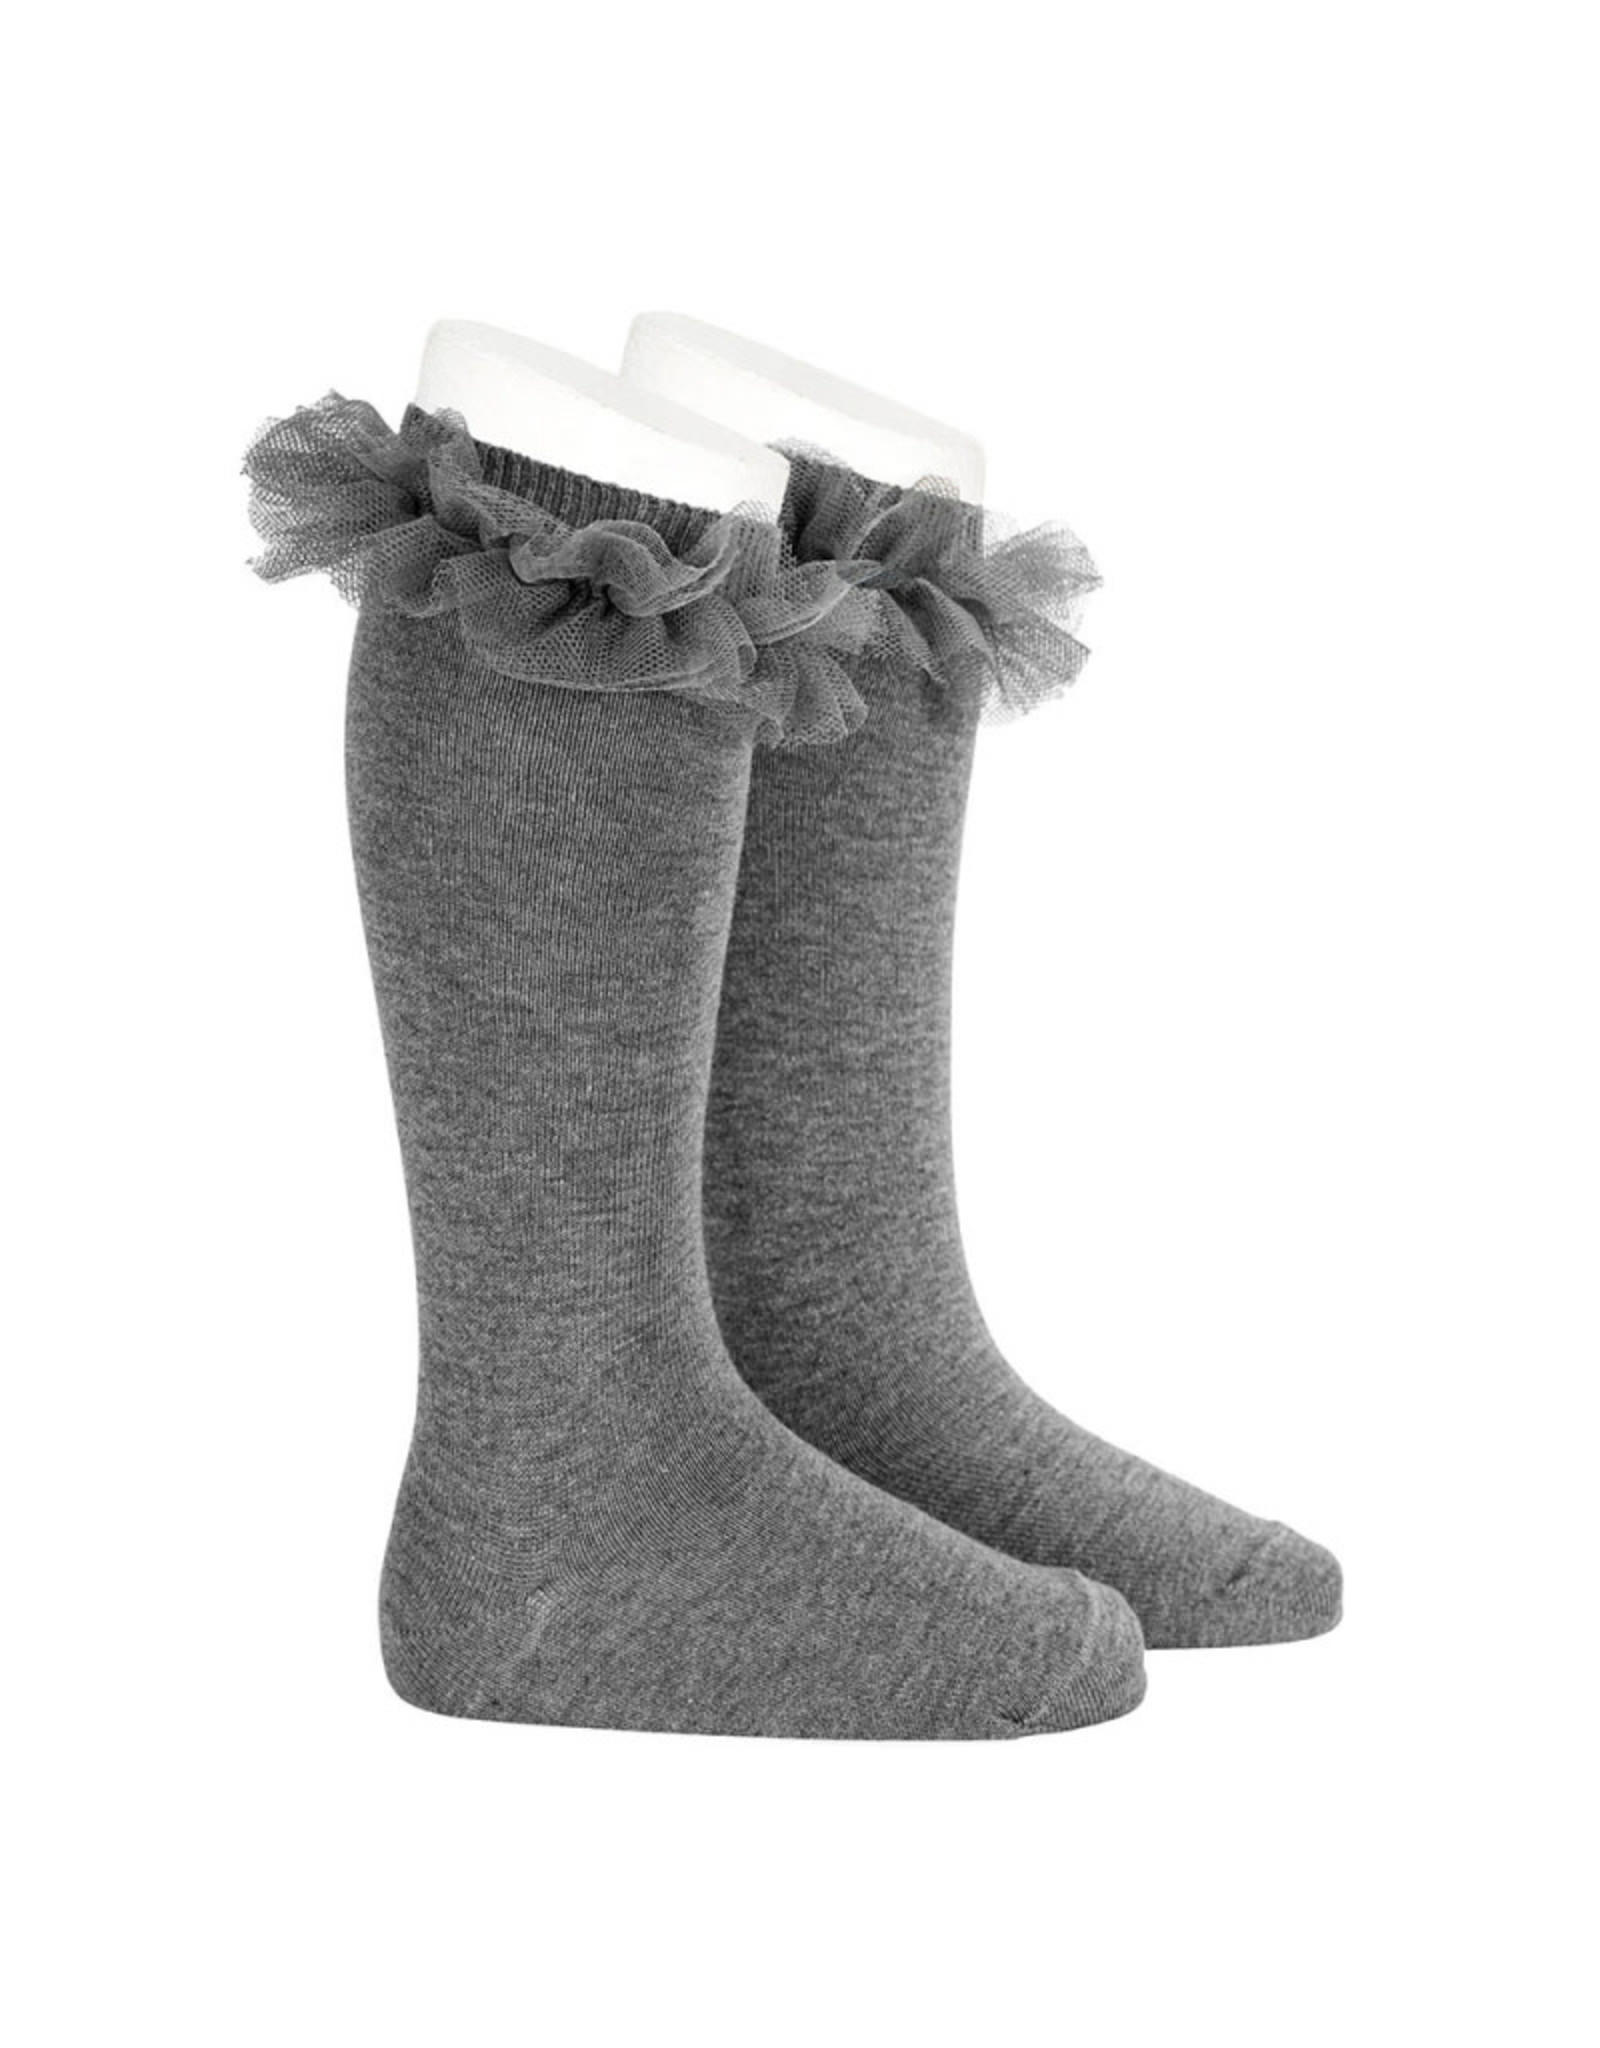 CONDOR Grey Tulle Knee Socks